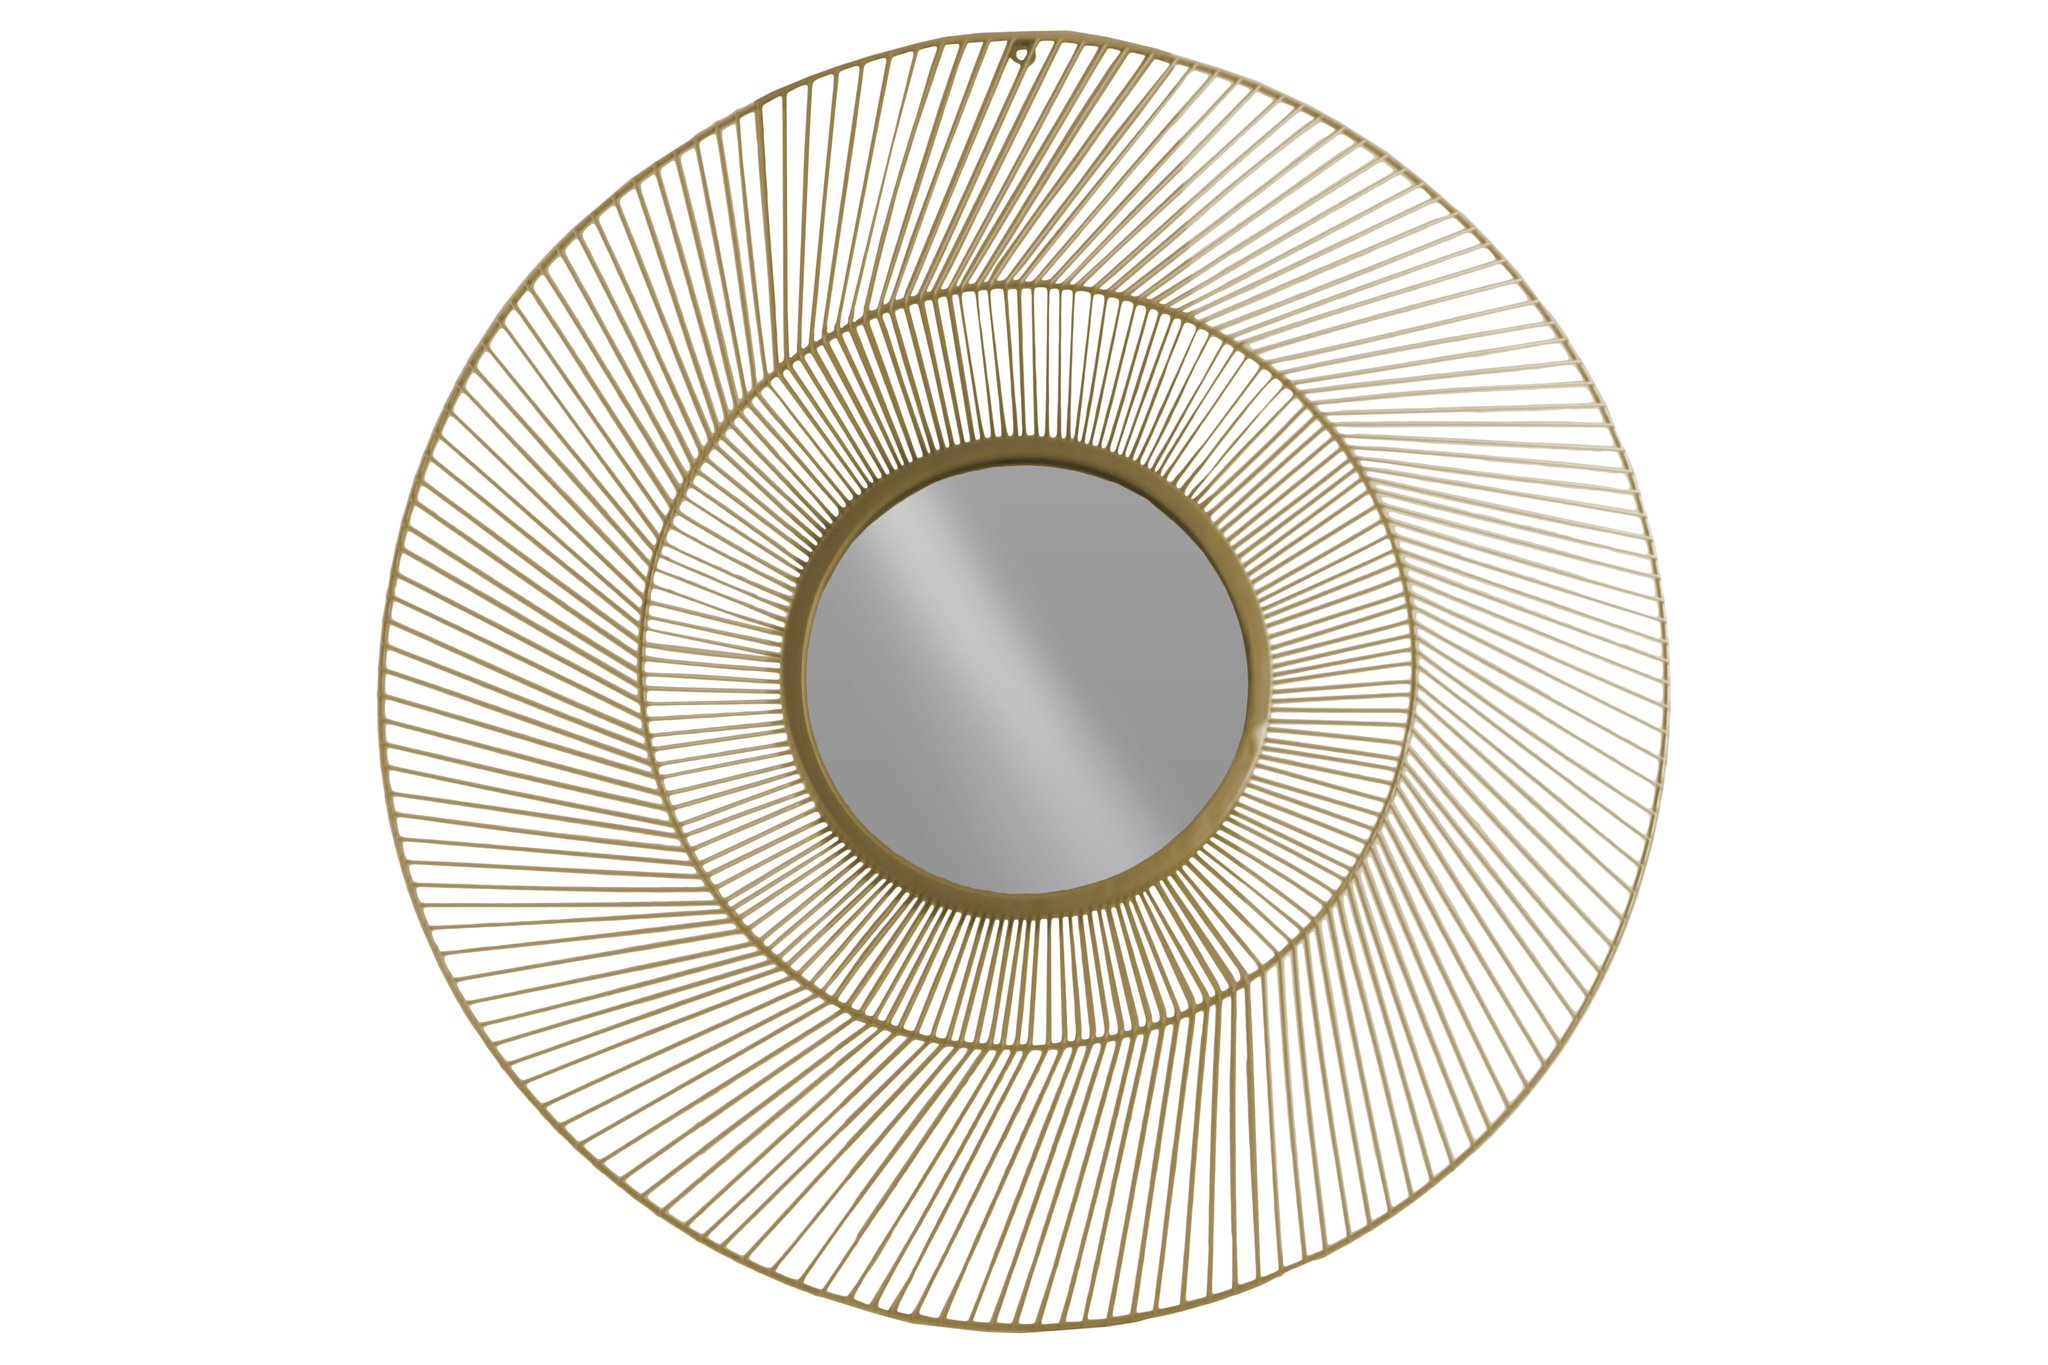 Urban Trends 31003 Metal Round Wall Mirror with Sunburst Design, Gold - Item Type: mirror Item material: metal Item finish: metallic finish - bathroom-mirrors, bathroom-accessories, bathroom - 81Phrl7VBML -